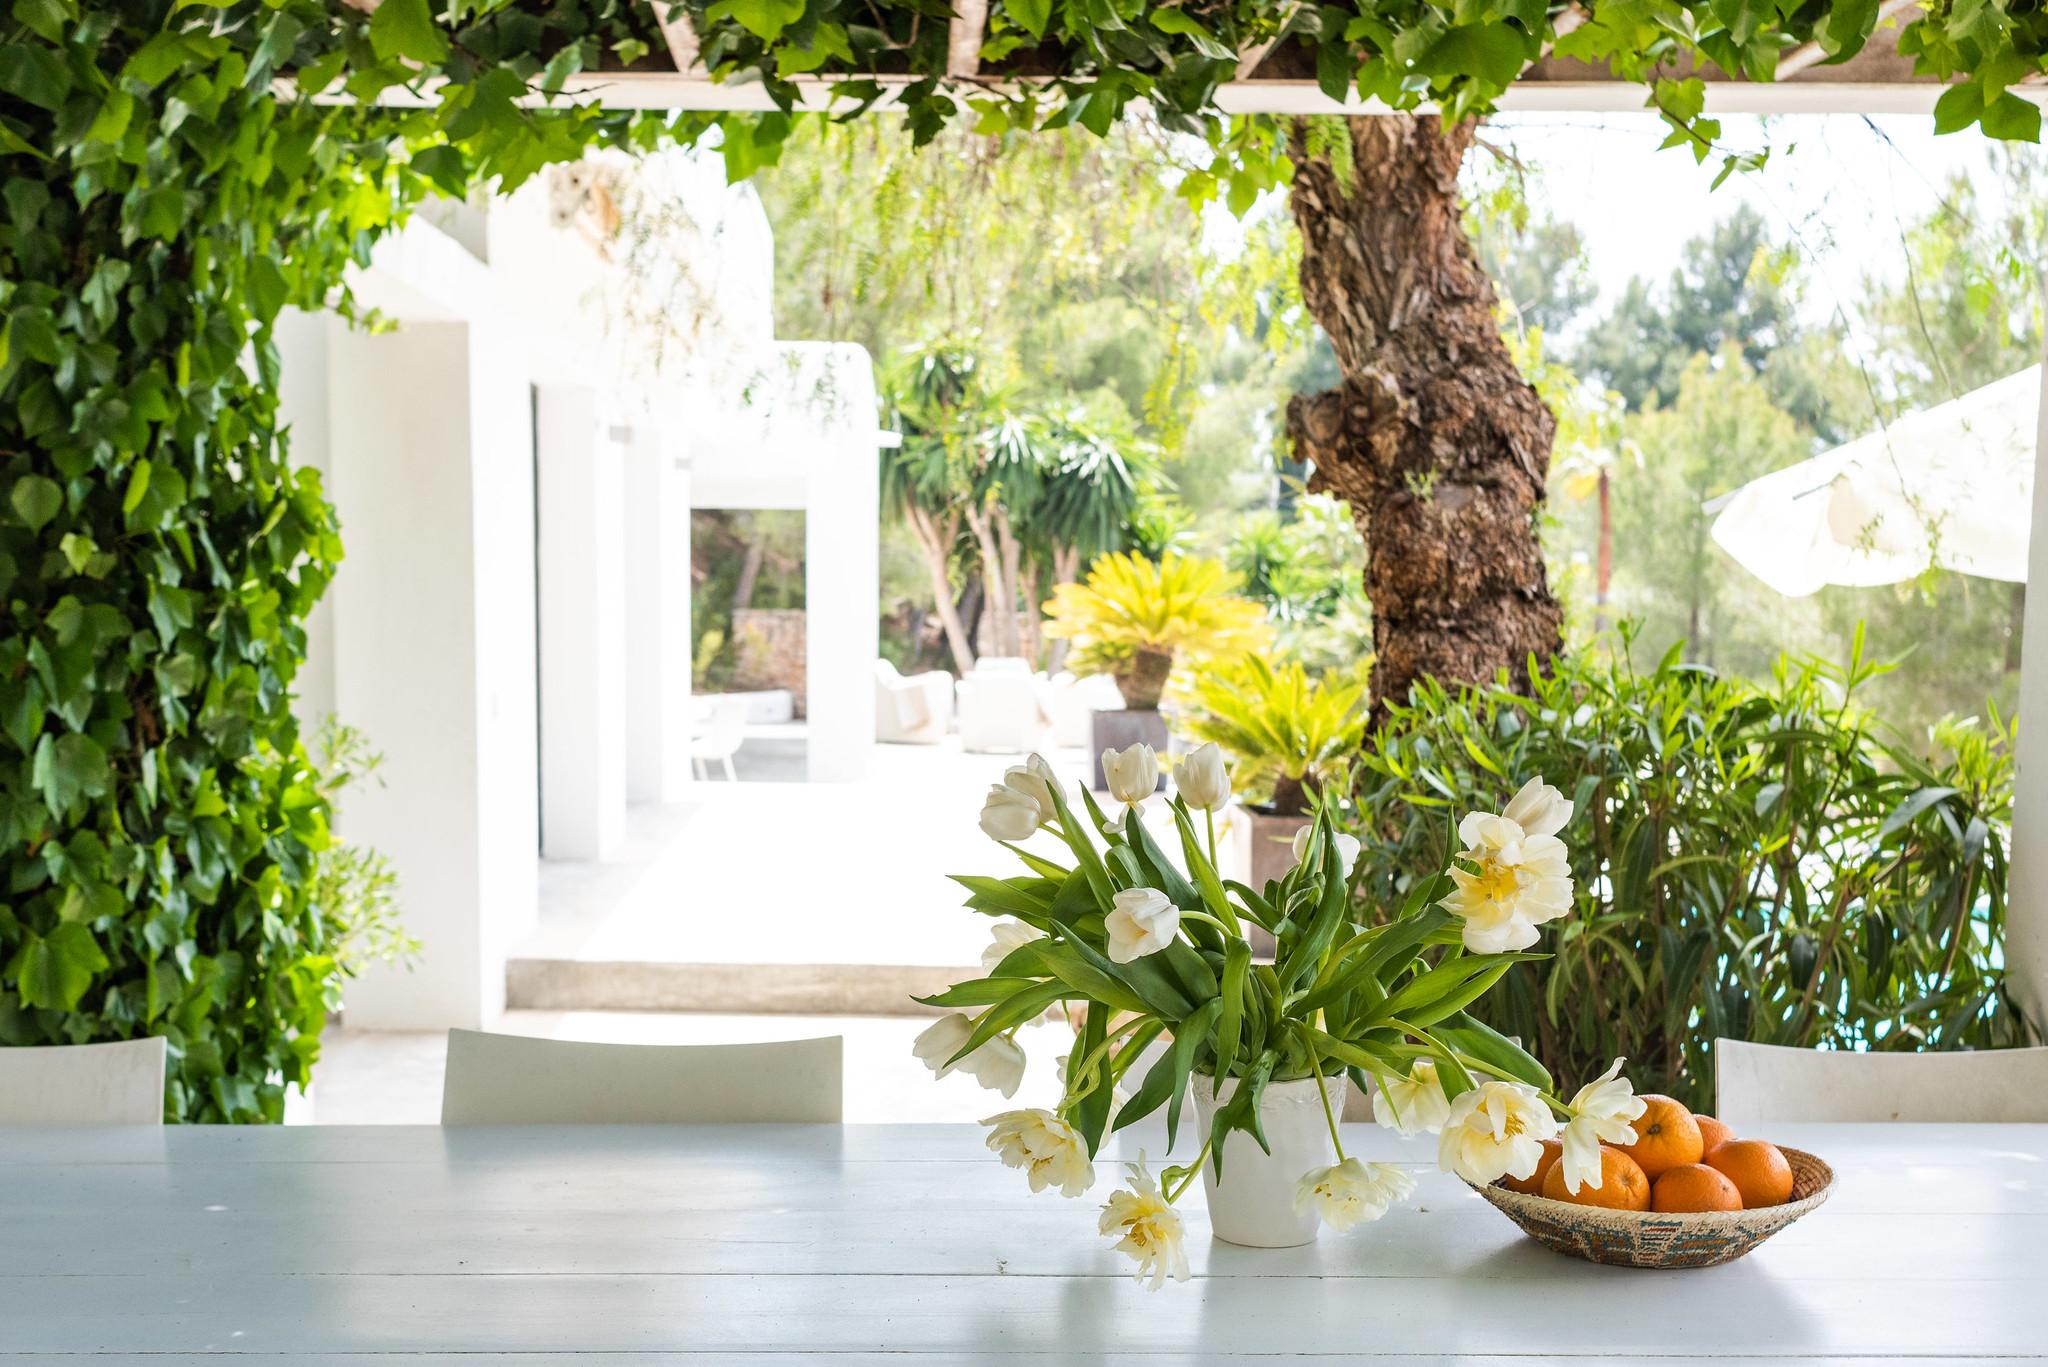 https://www.white-ibiza.com/wp-content/uploads/2020/06/white-ibiza-villas-villa-azul-exterior-dining.jpg